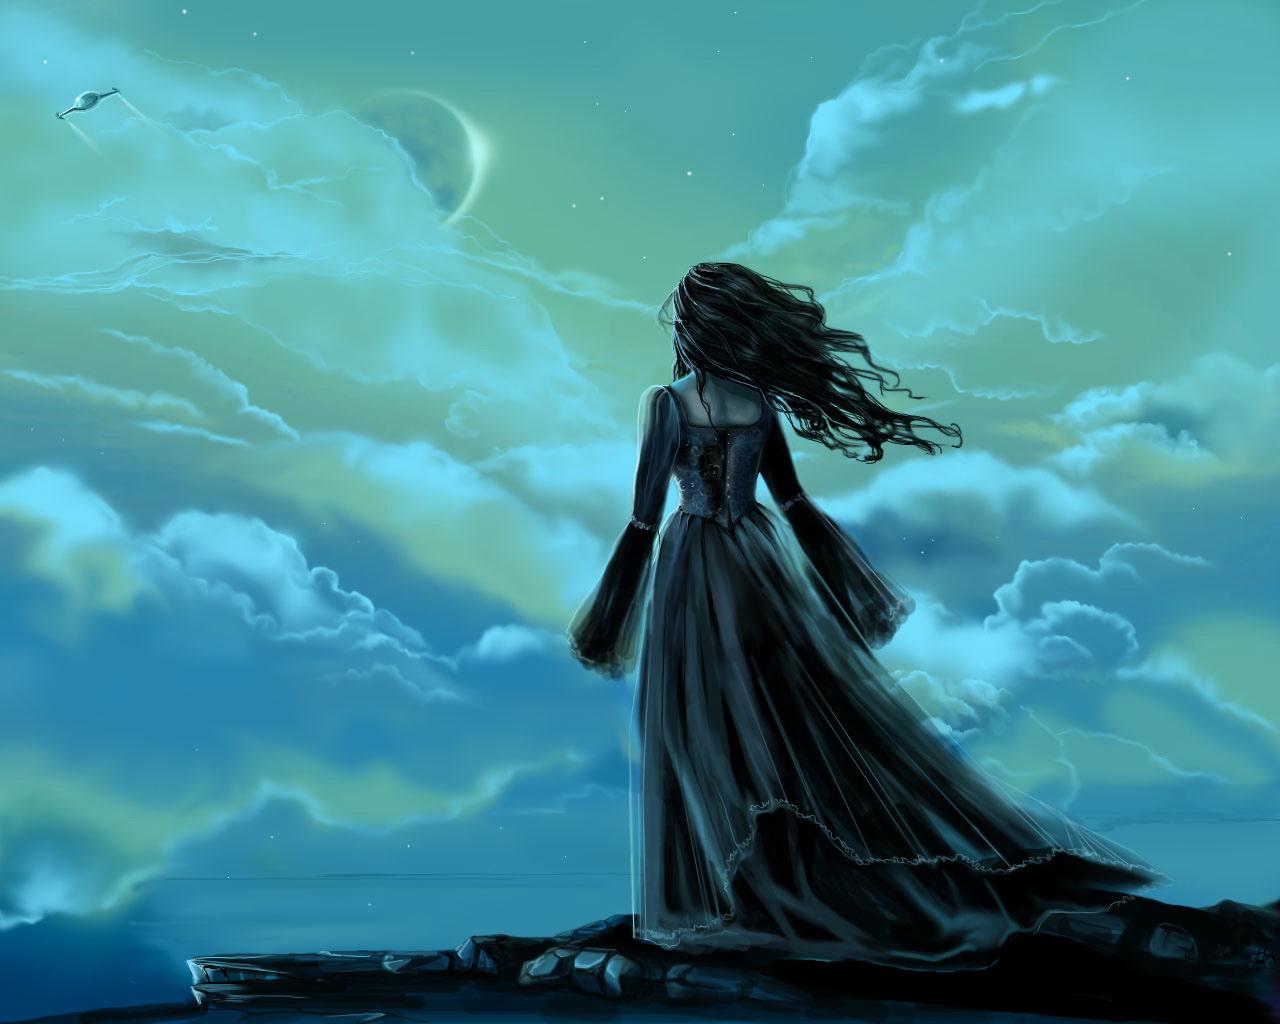 ws_Fantasy_girl_-_Night_sky_1280x1024.jpg